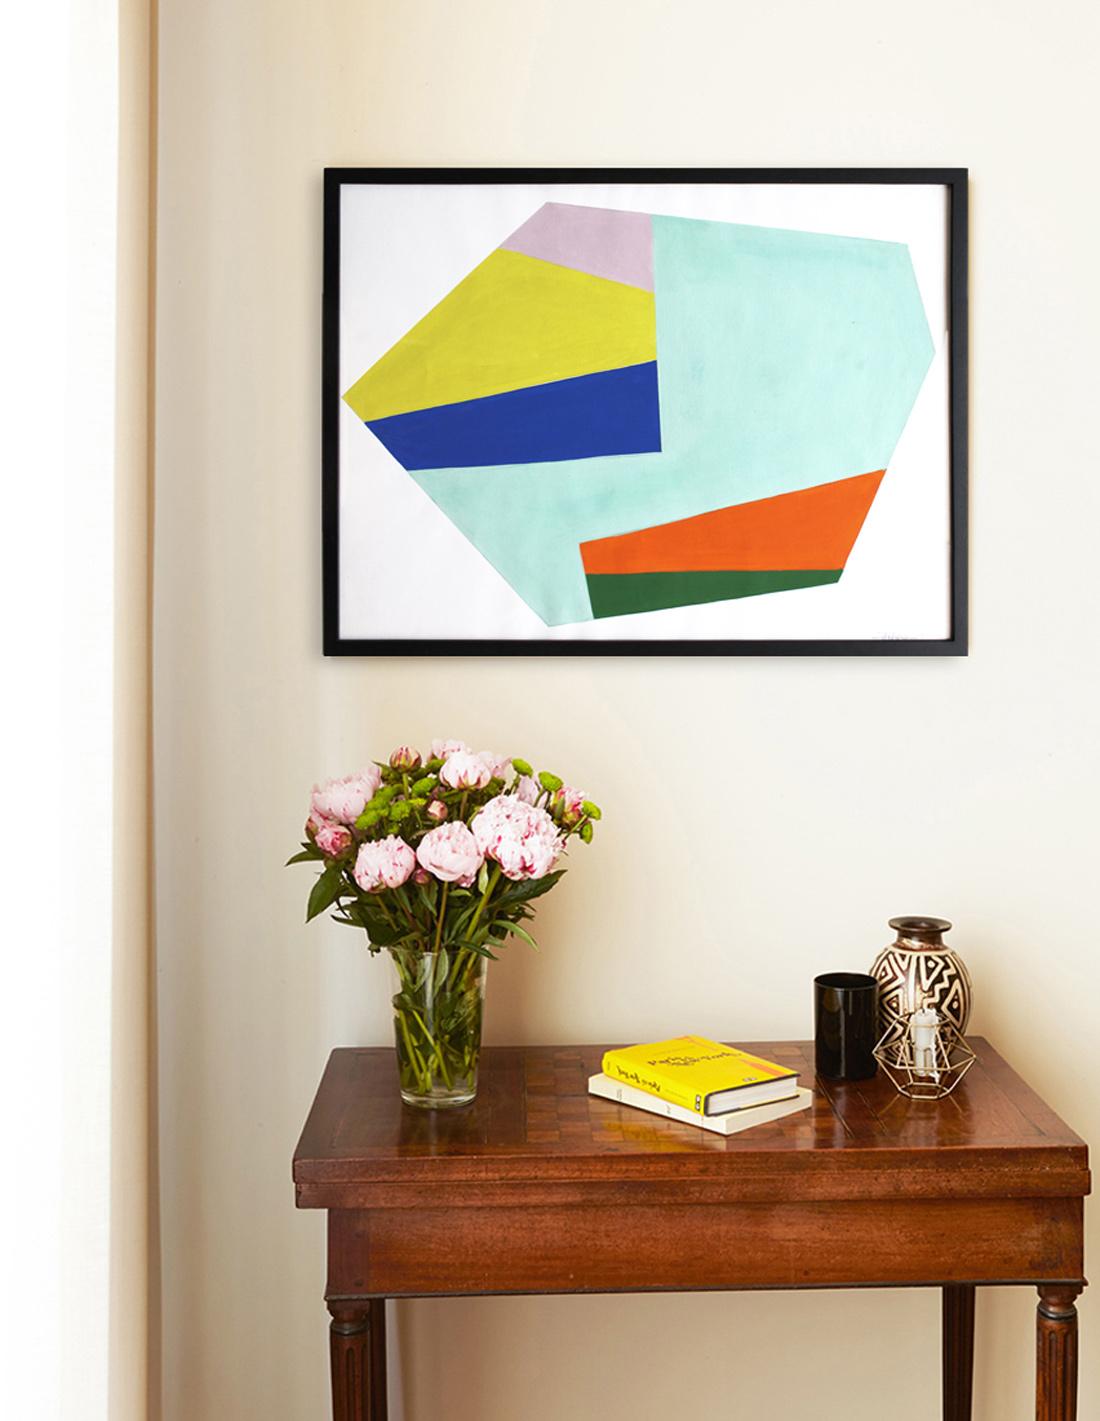 Sans-titre-Hexagone-(Bleu-rose-vert-jaune-orange-et-bleu-ciel)-insitu